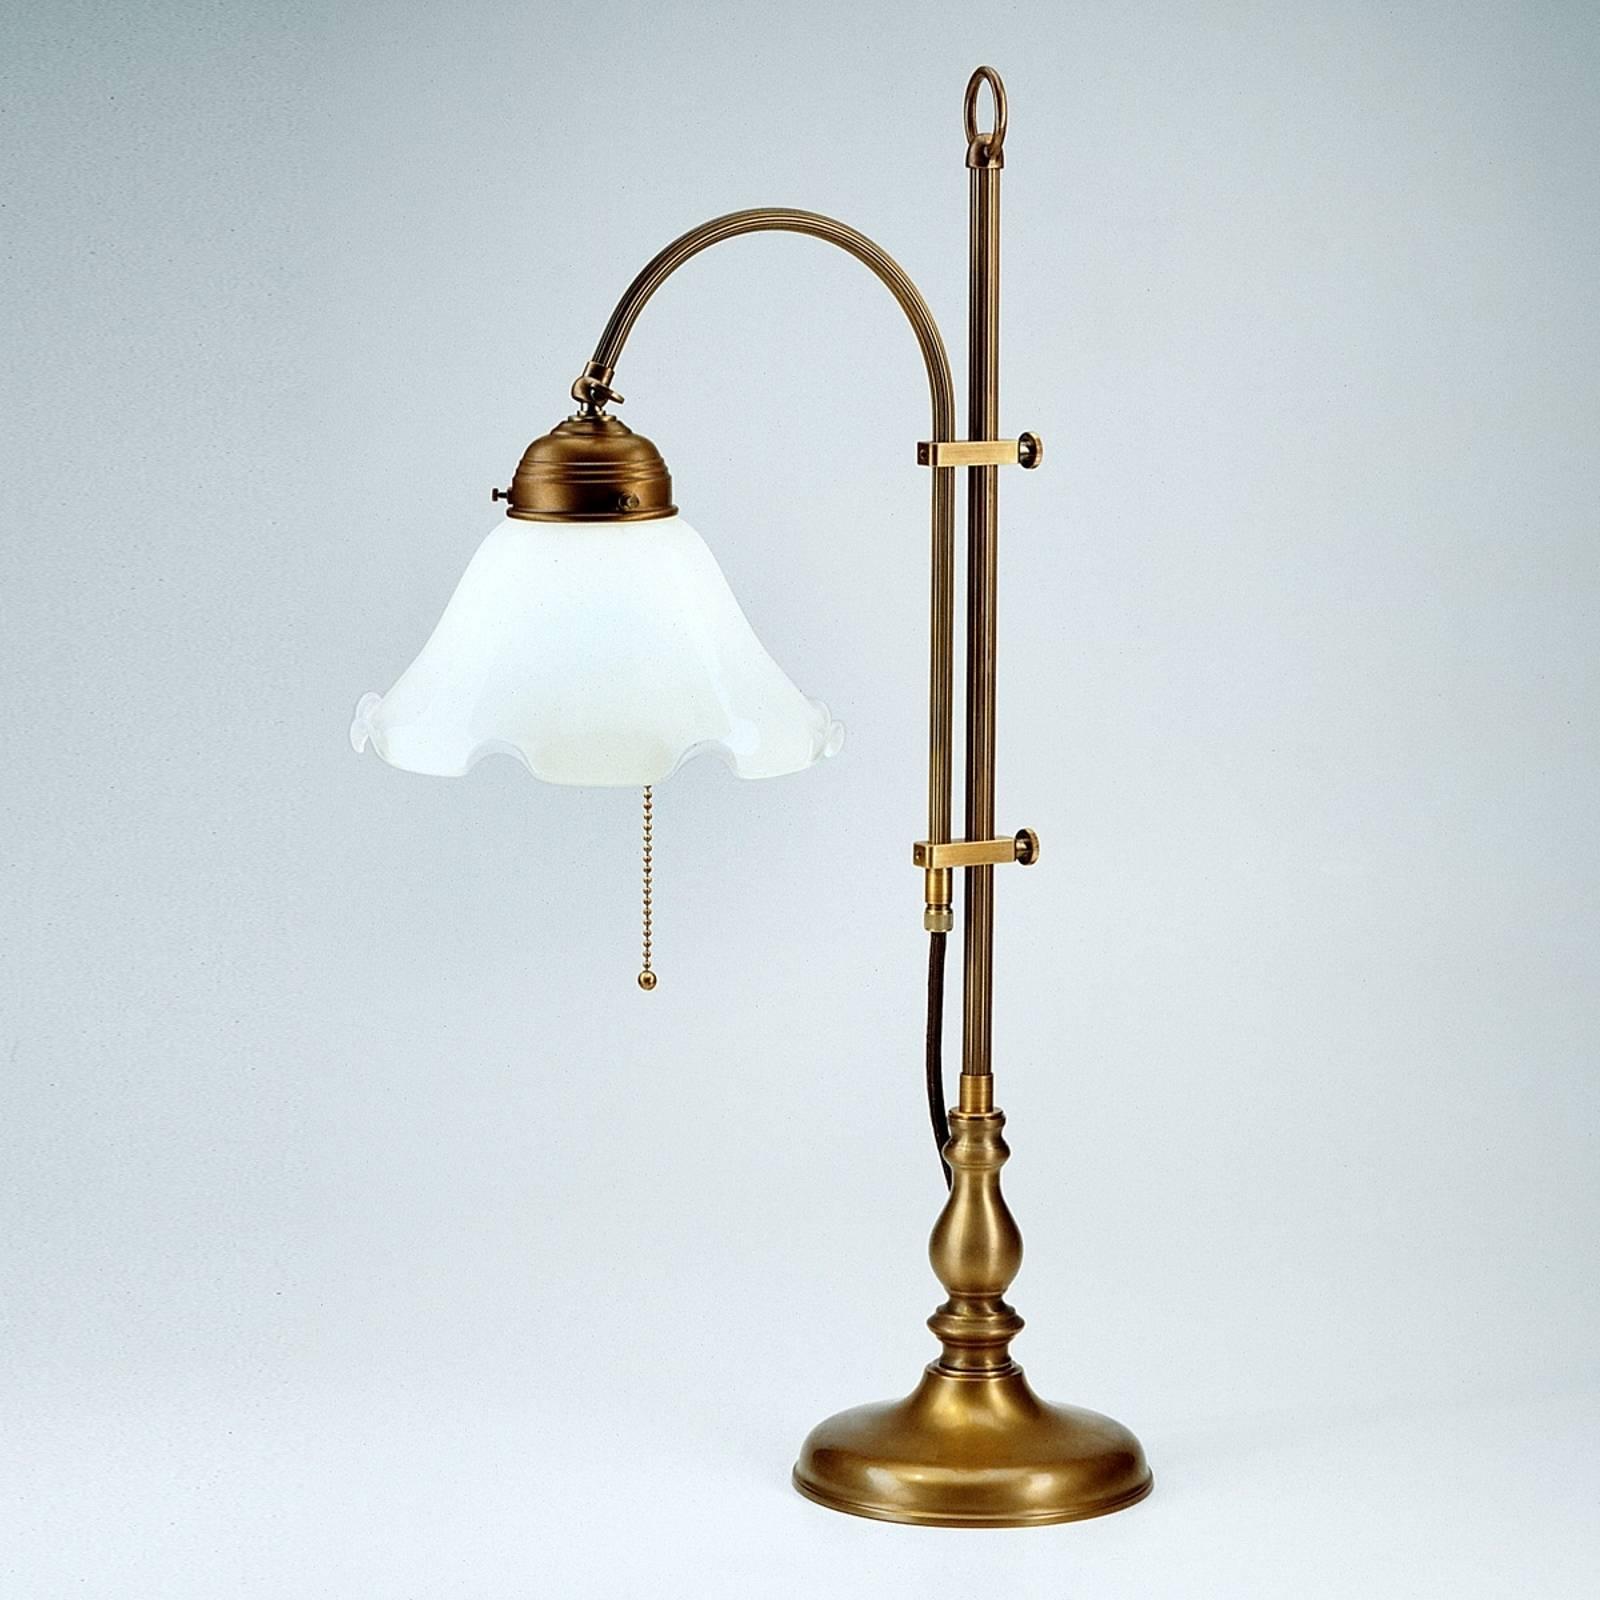 Tafellamp Ernst - praktisch verstelbaar